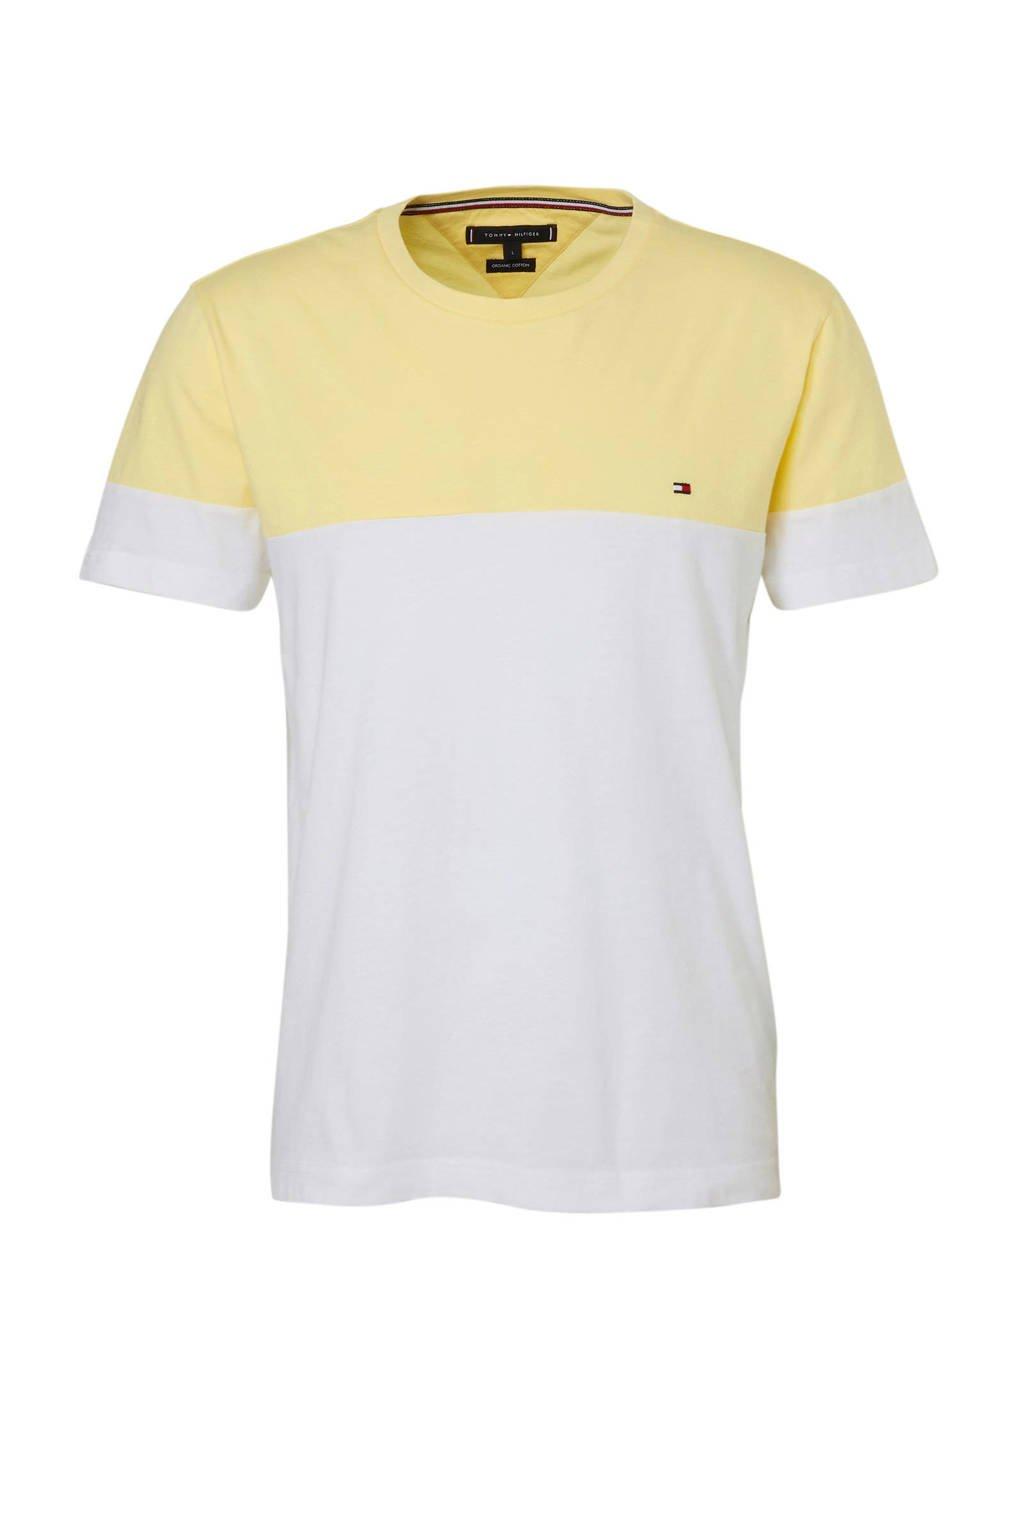 Tommy Hilfiger T-shirt, Wit/geel